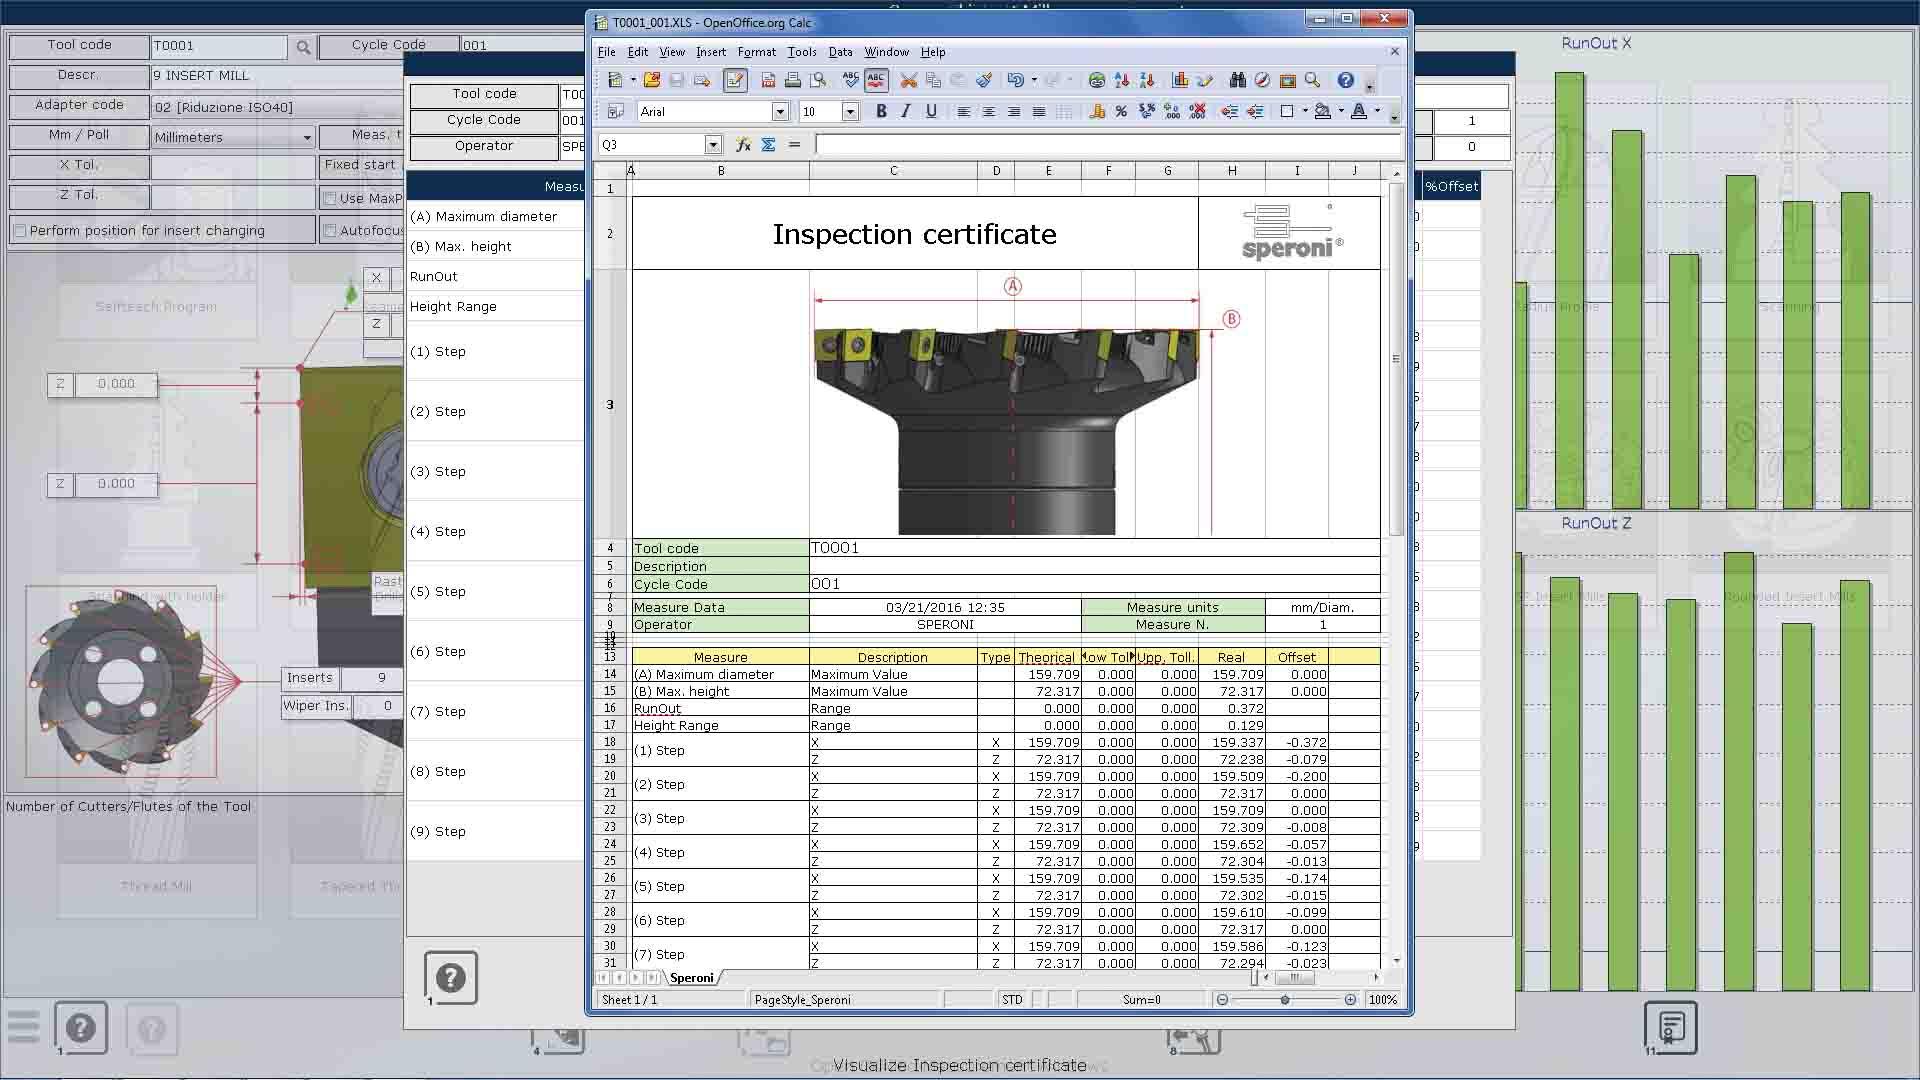 Edge Pro Control Software self-teach programming screen capture.